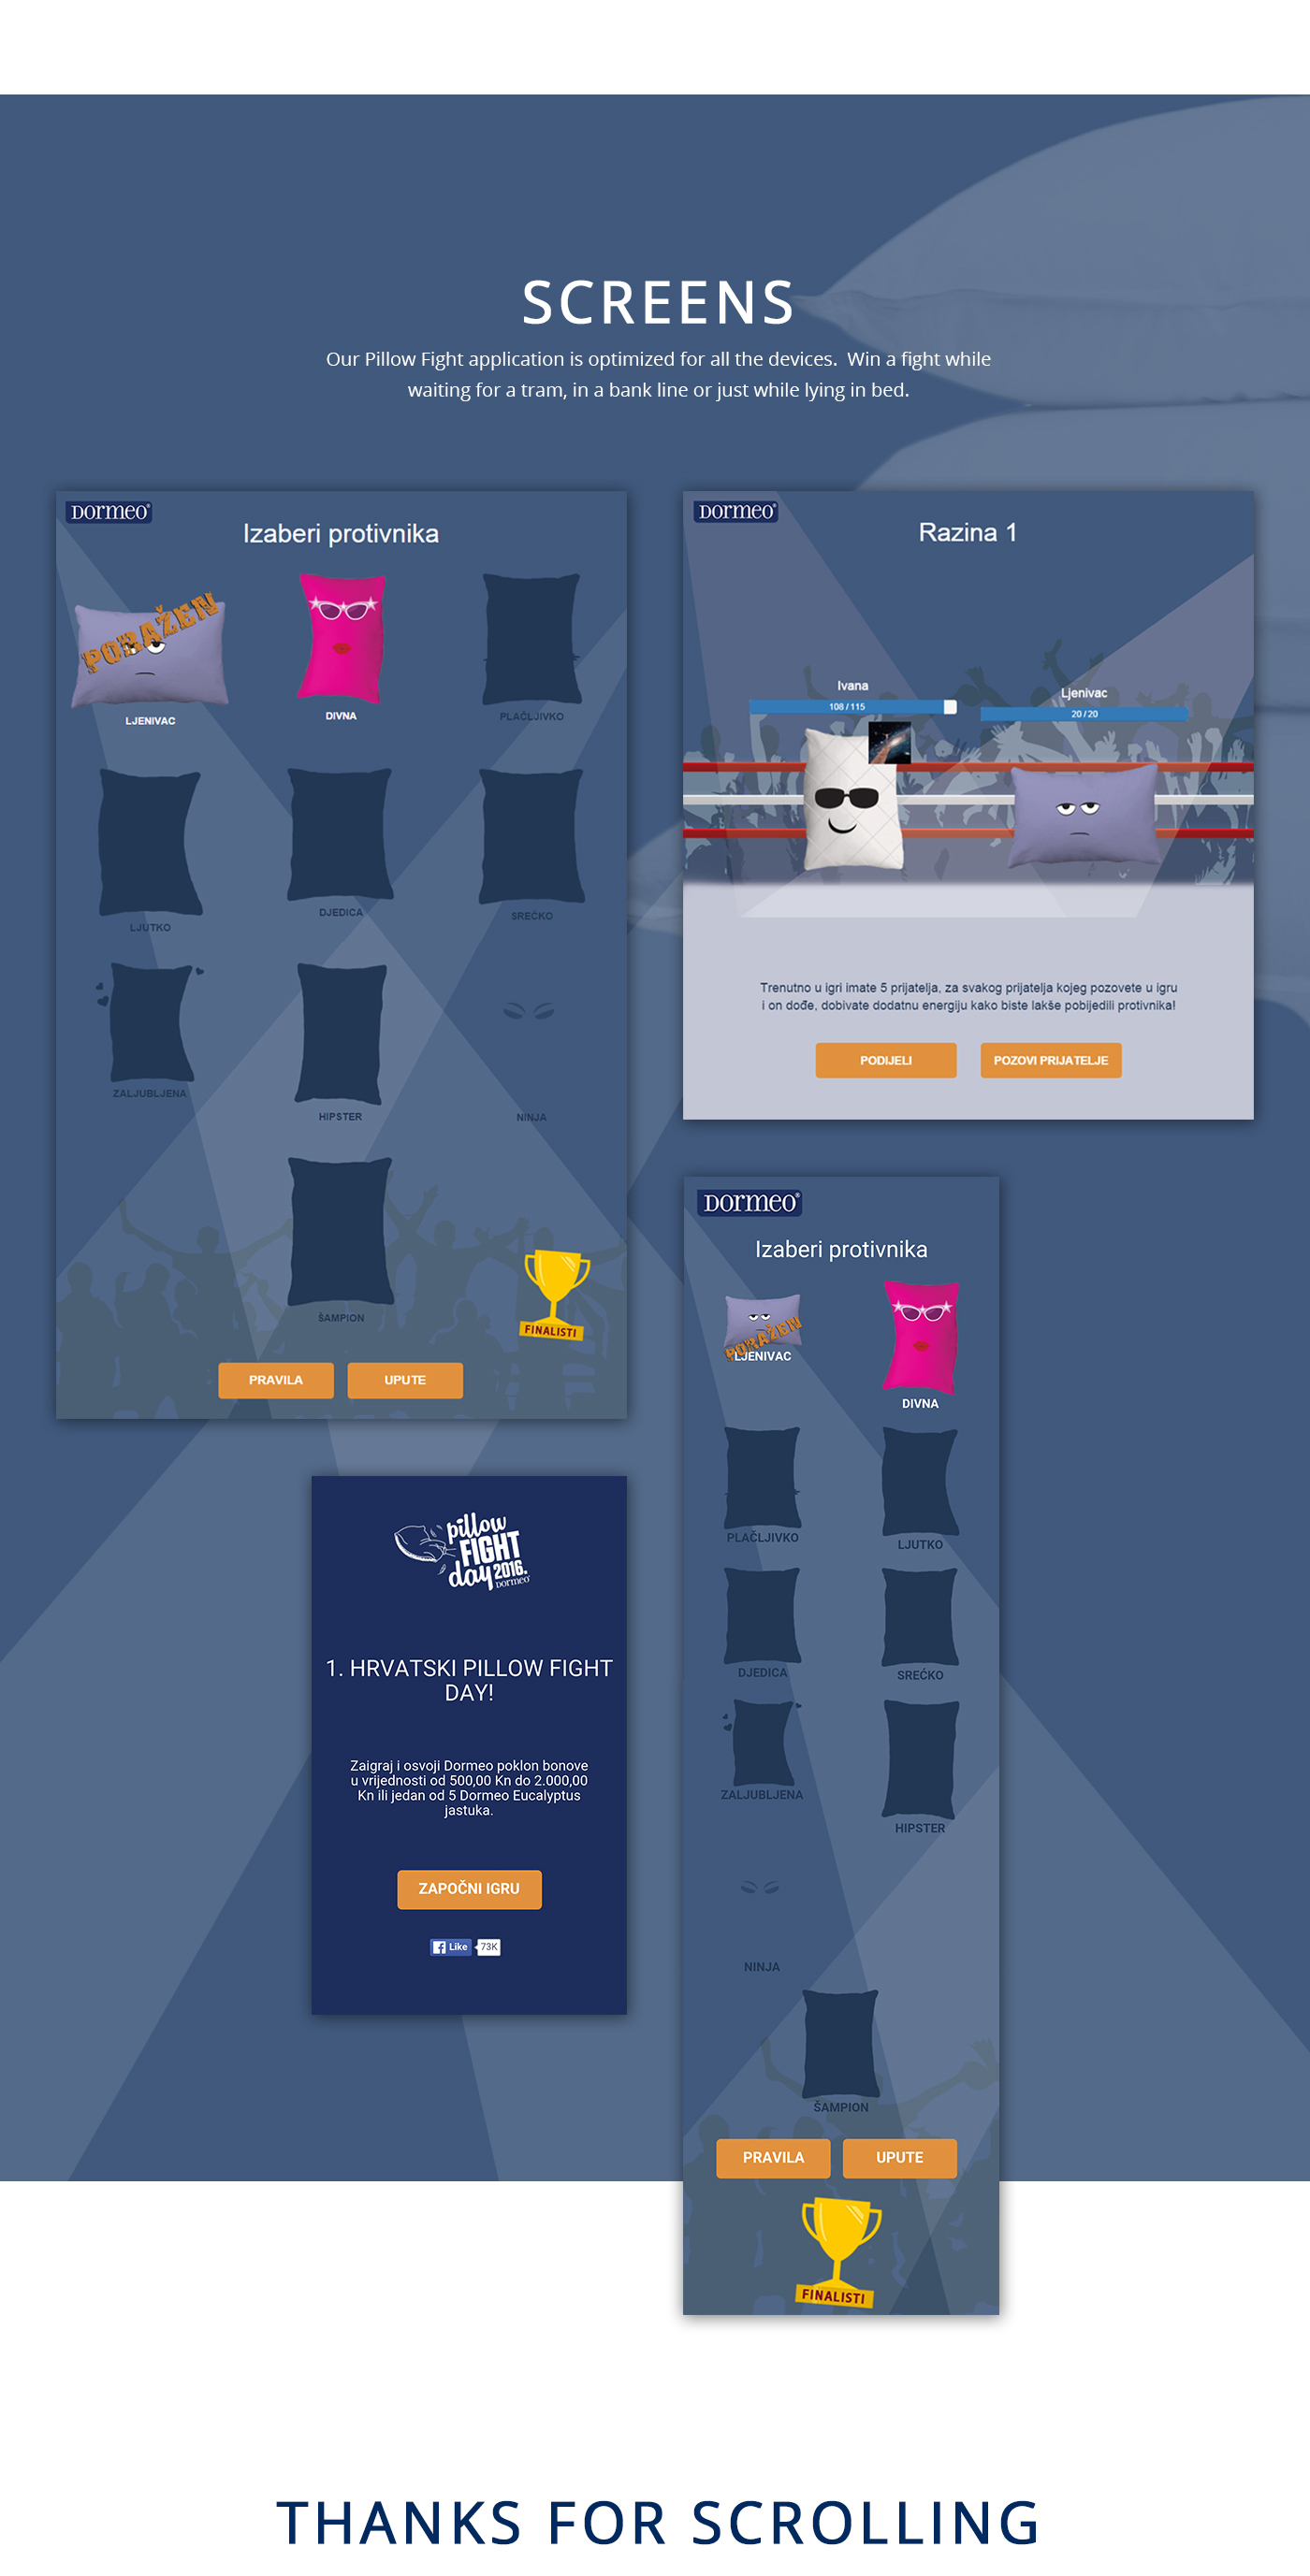 facebook application game Click UI ux design Web Website pillow Dormeo contest prize development